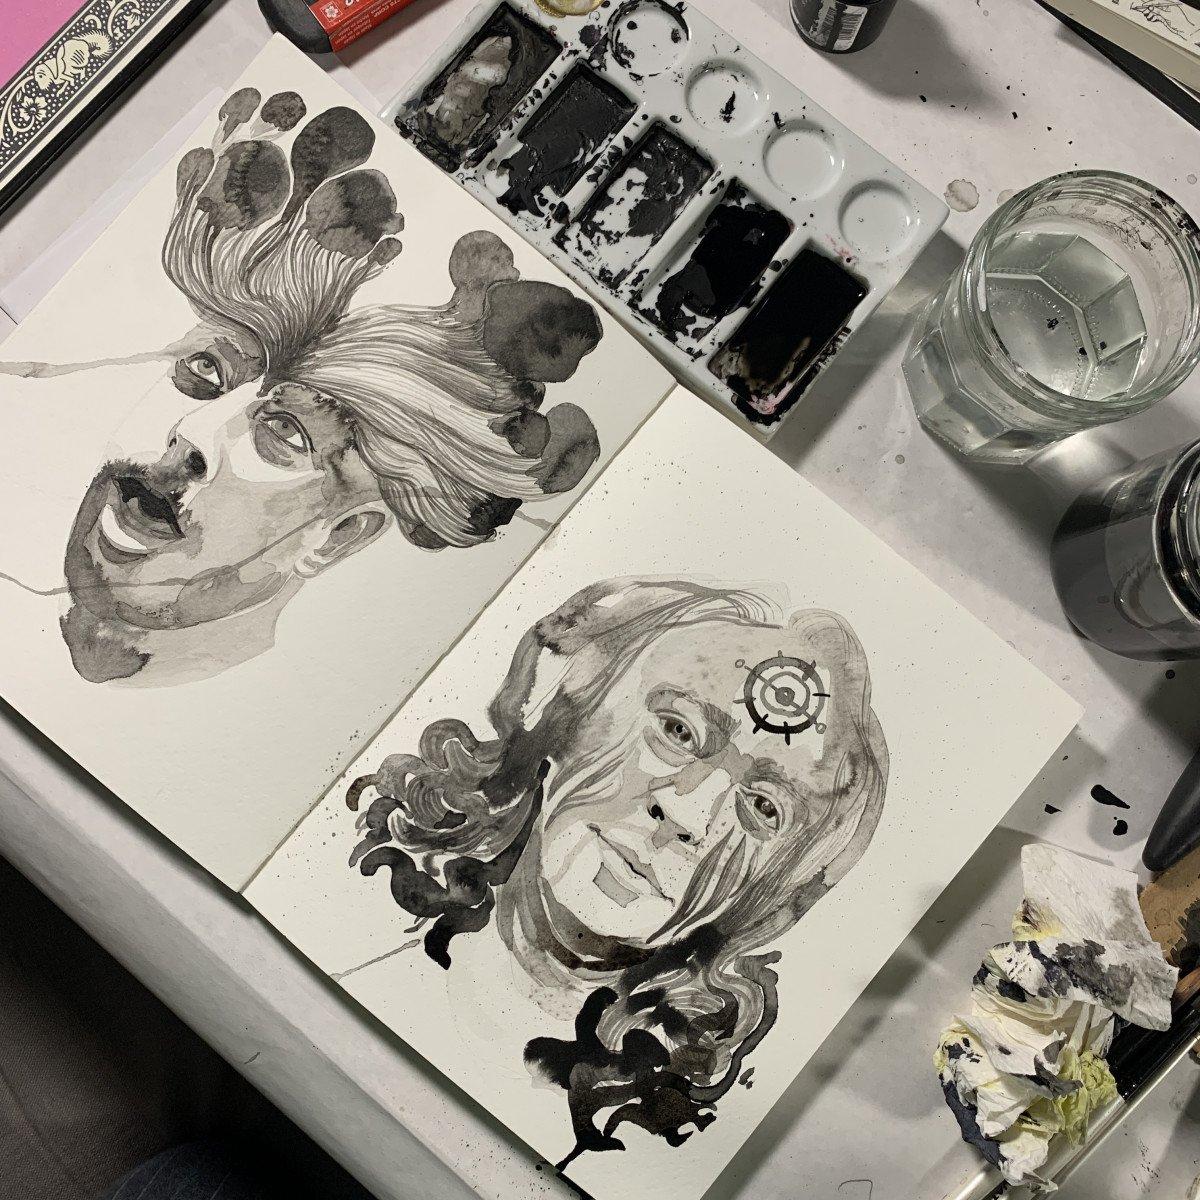 The Undead Come Alive! Zombie Portraits Ink killerpancake ki11erpancake illustration halloween